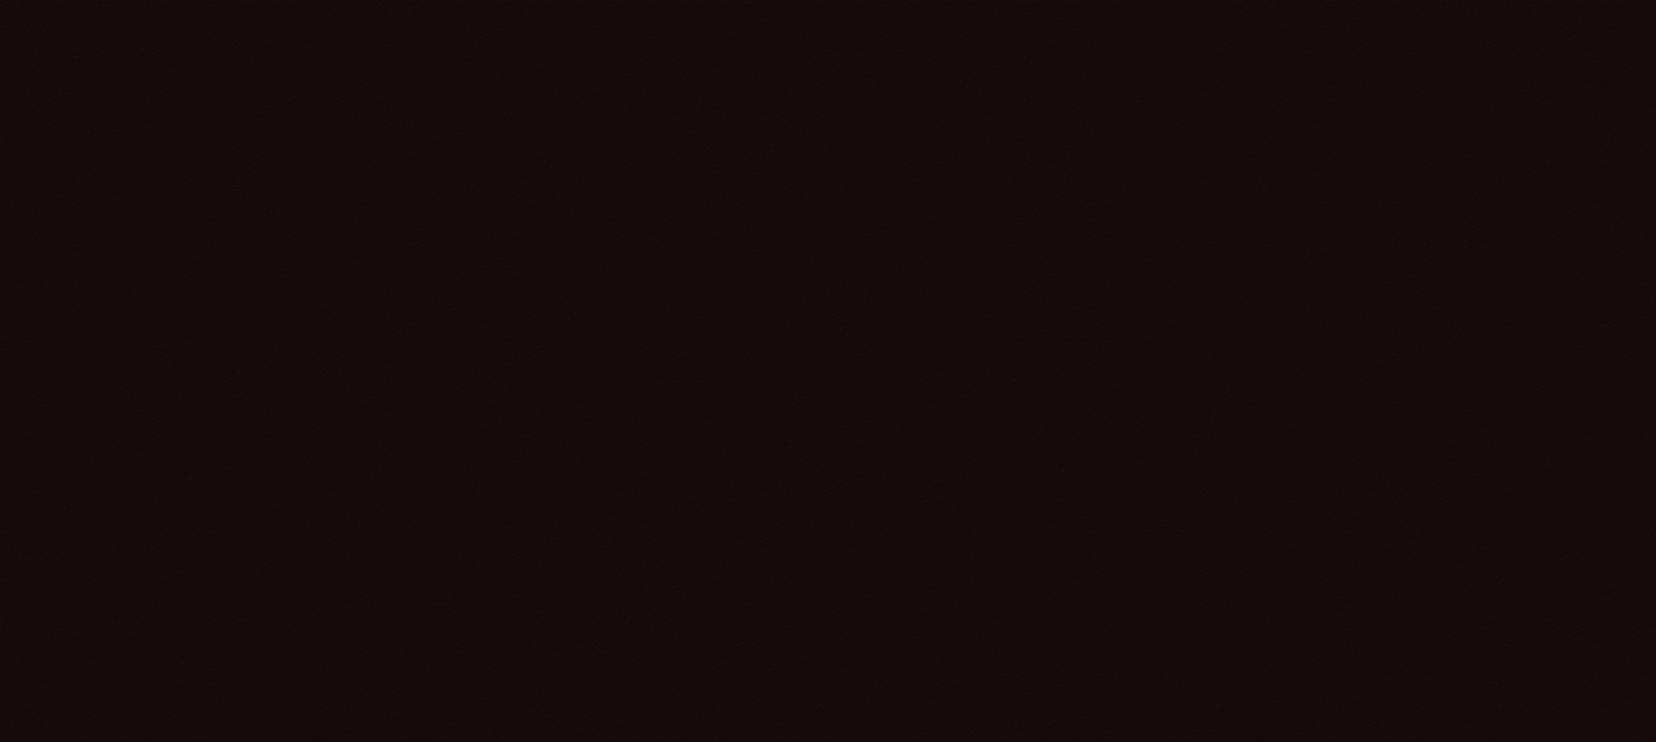 Deko RAL 8017 Schokoladenbraun_glatt.jpg